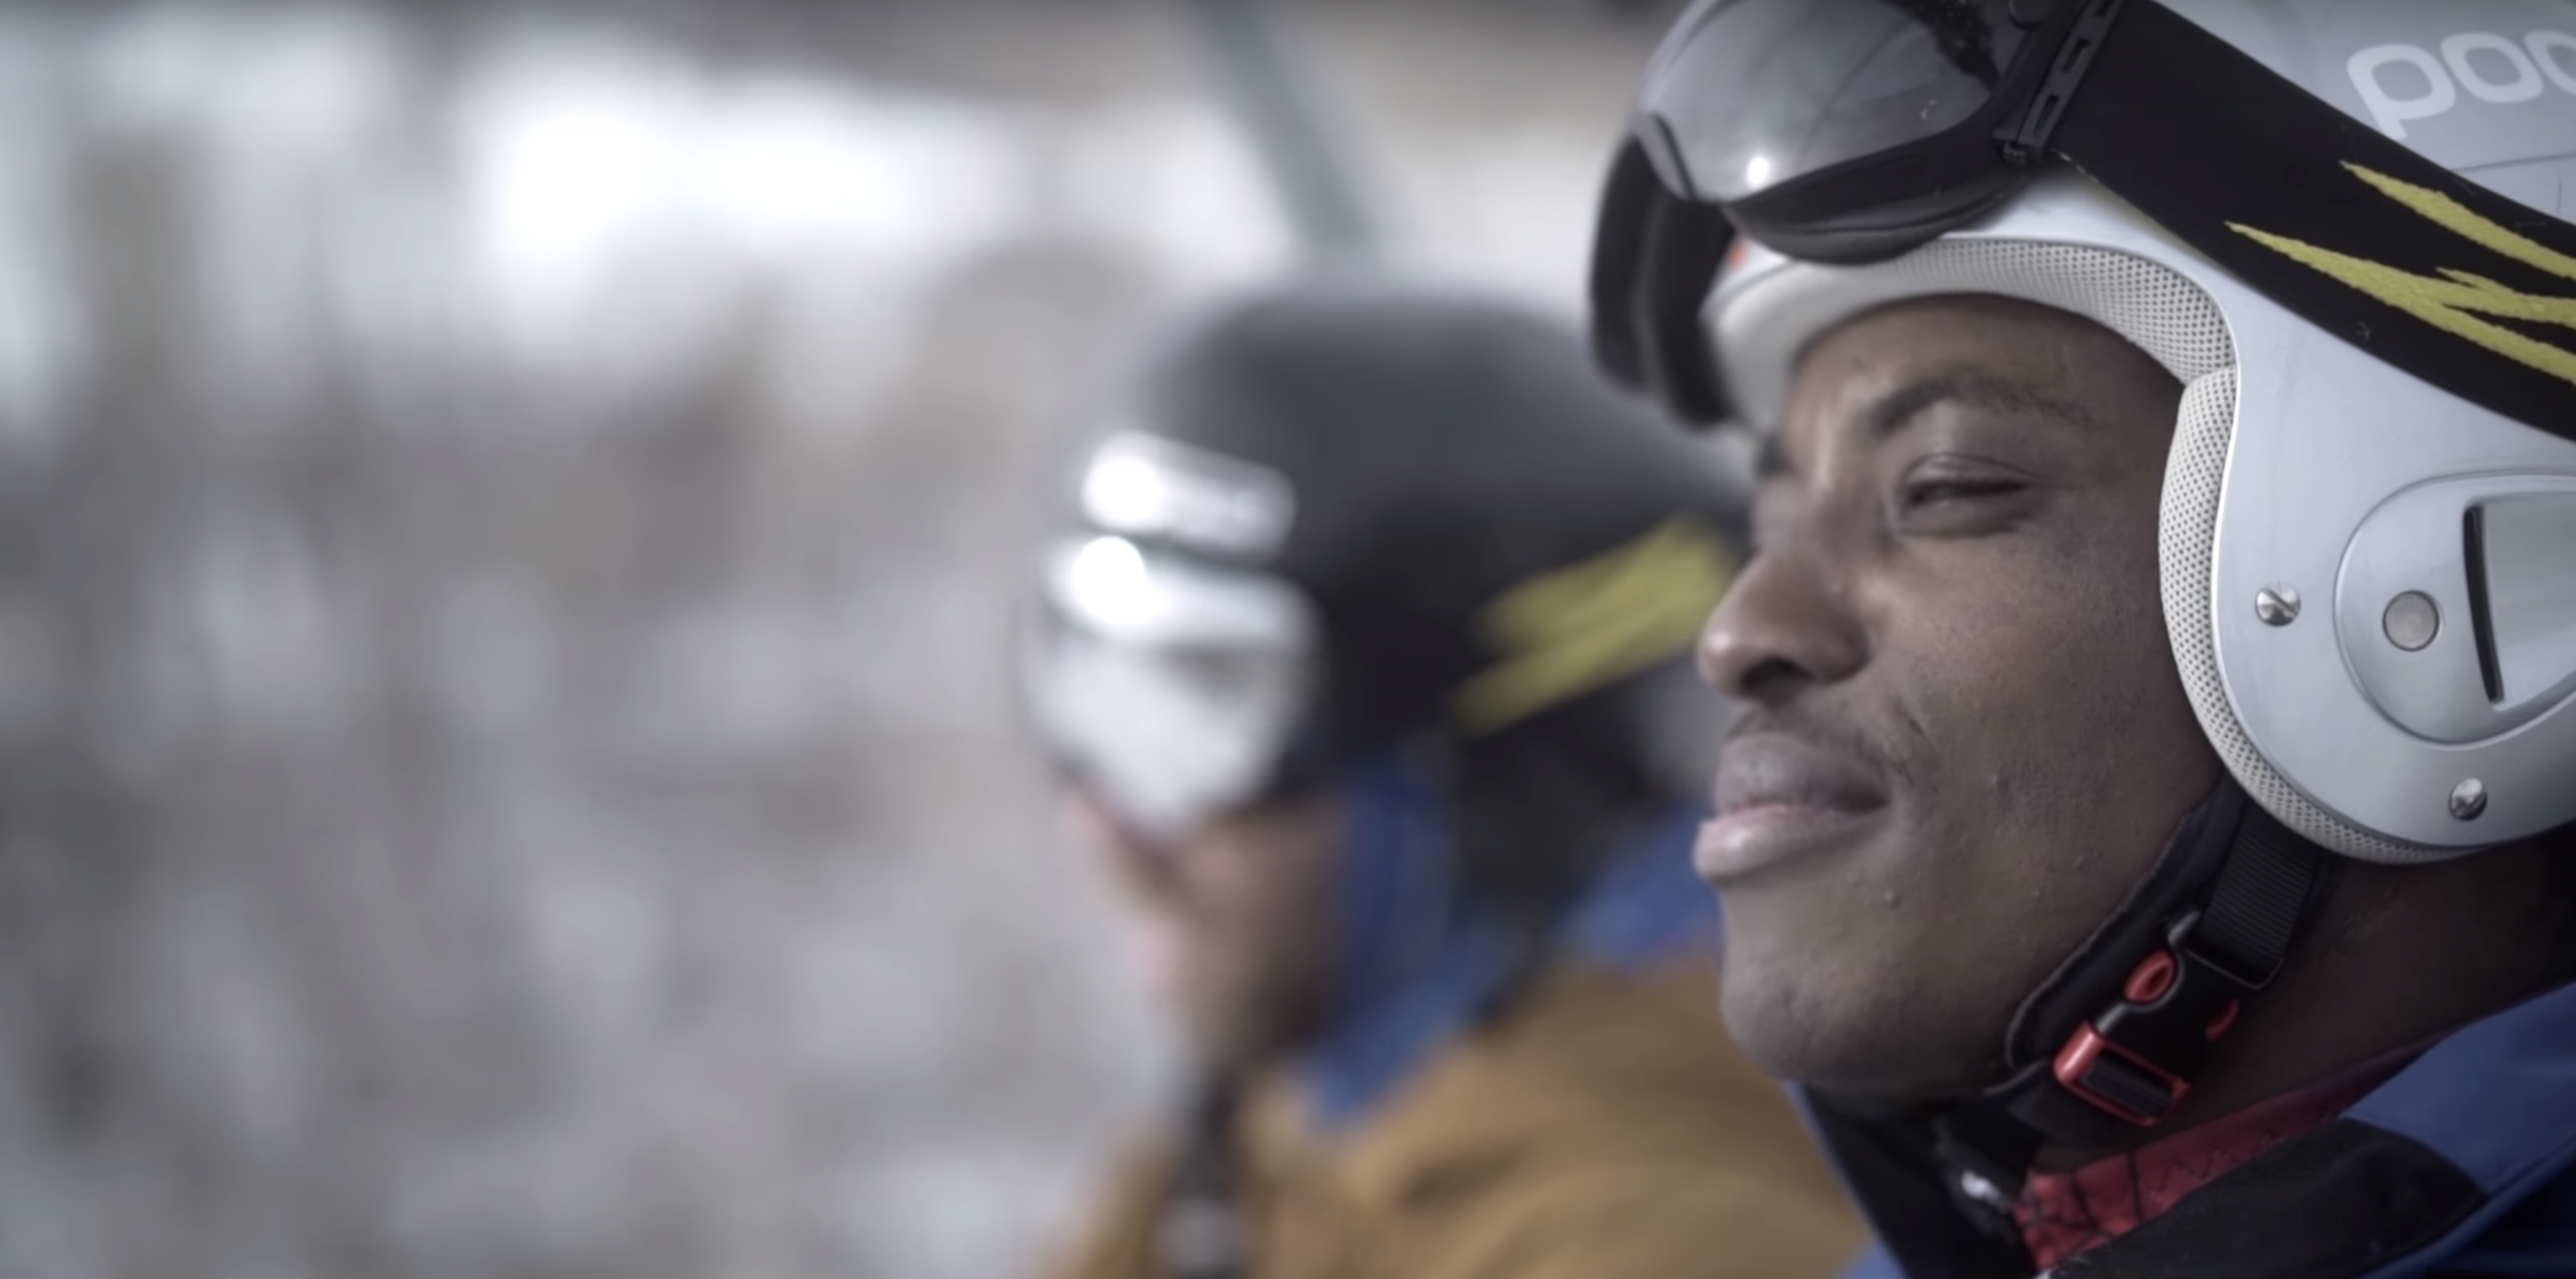 side profile of man in ski equipment